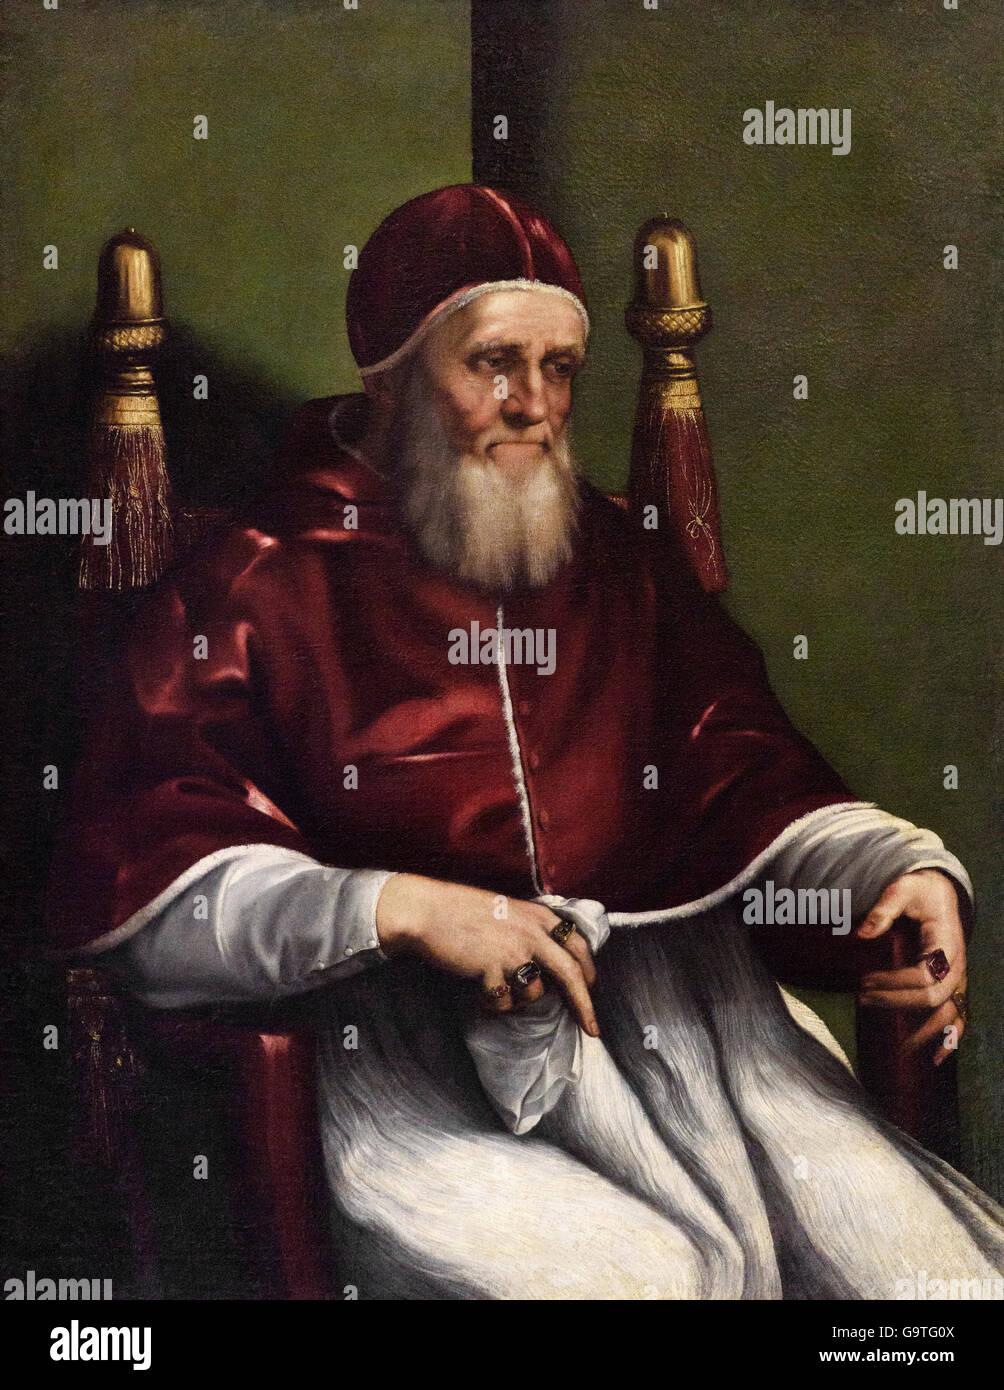 Copy after Raphael, Portrait of Pope Julius II (1443–1513), end 16th C. - Stock Image